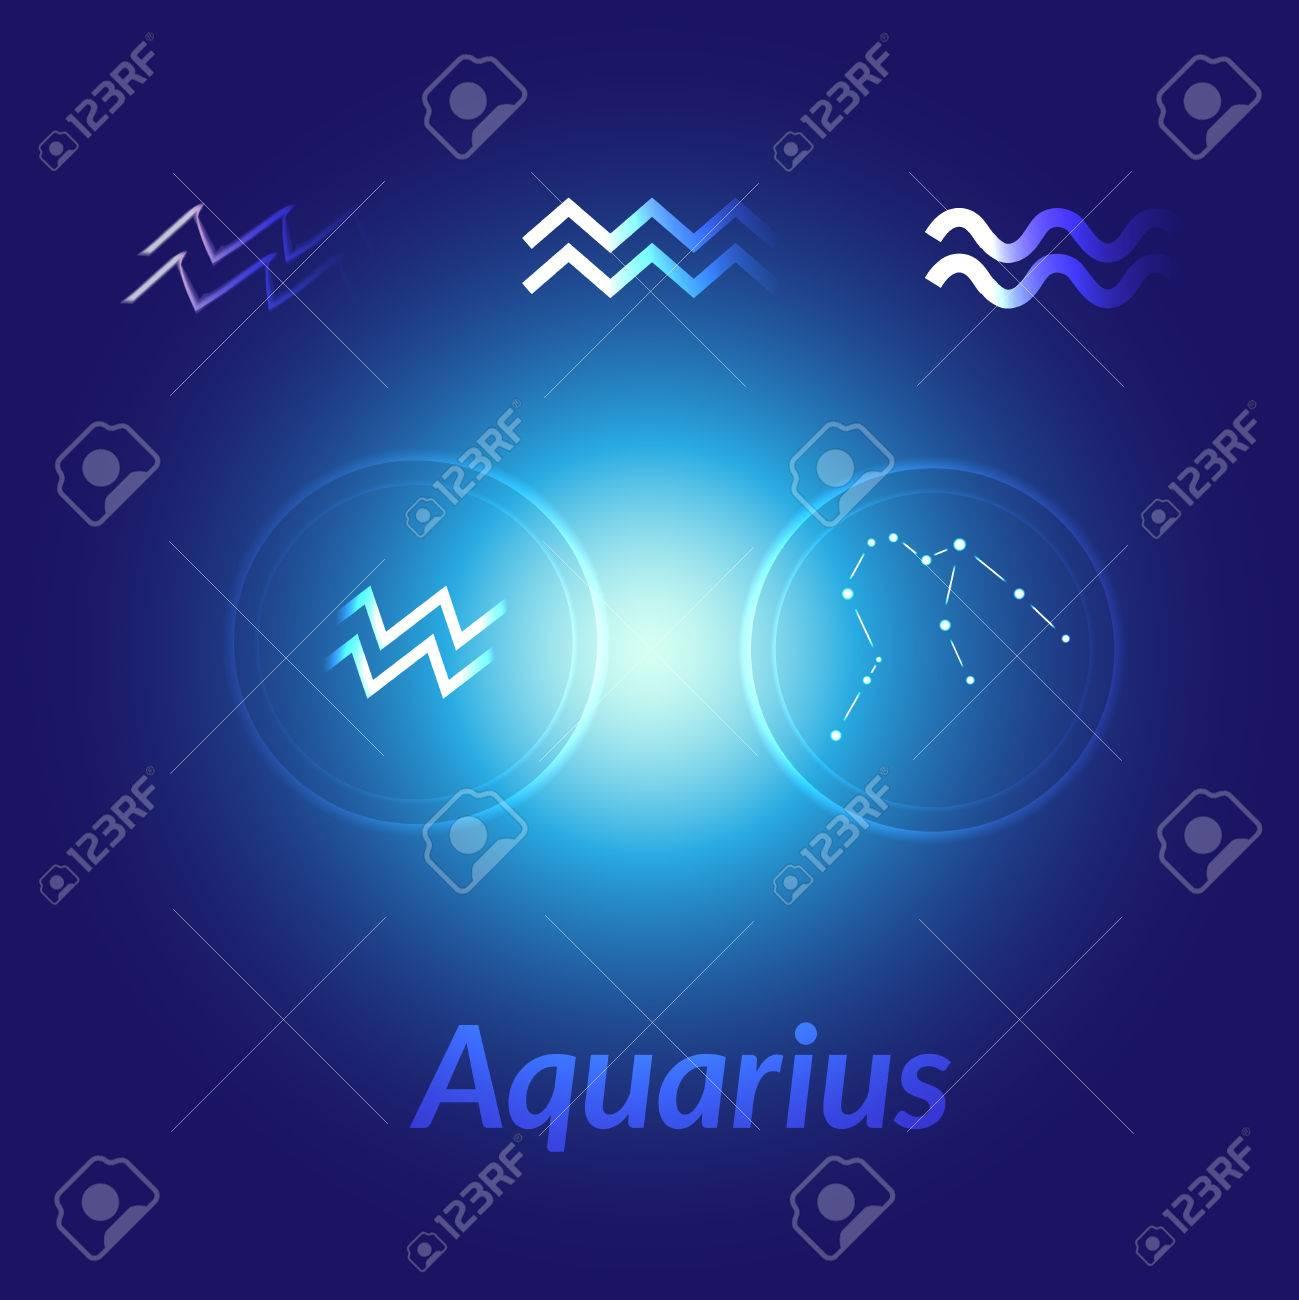 The Water Bearer Aquarius Sings Set Star Constellation Element